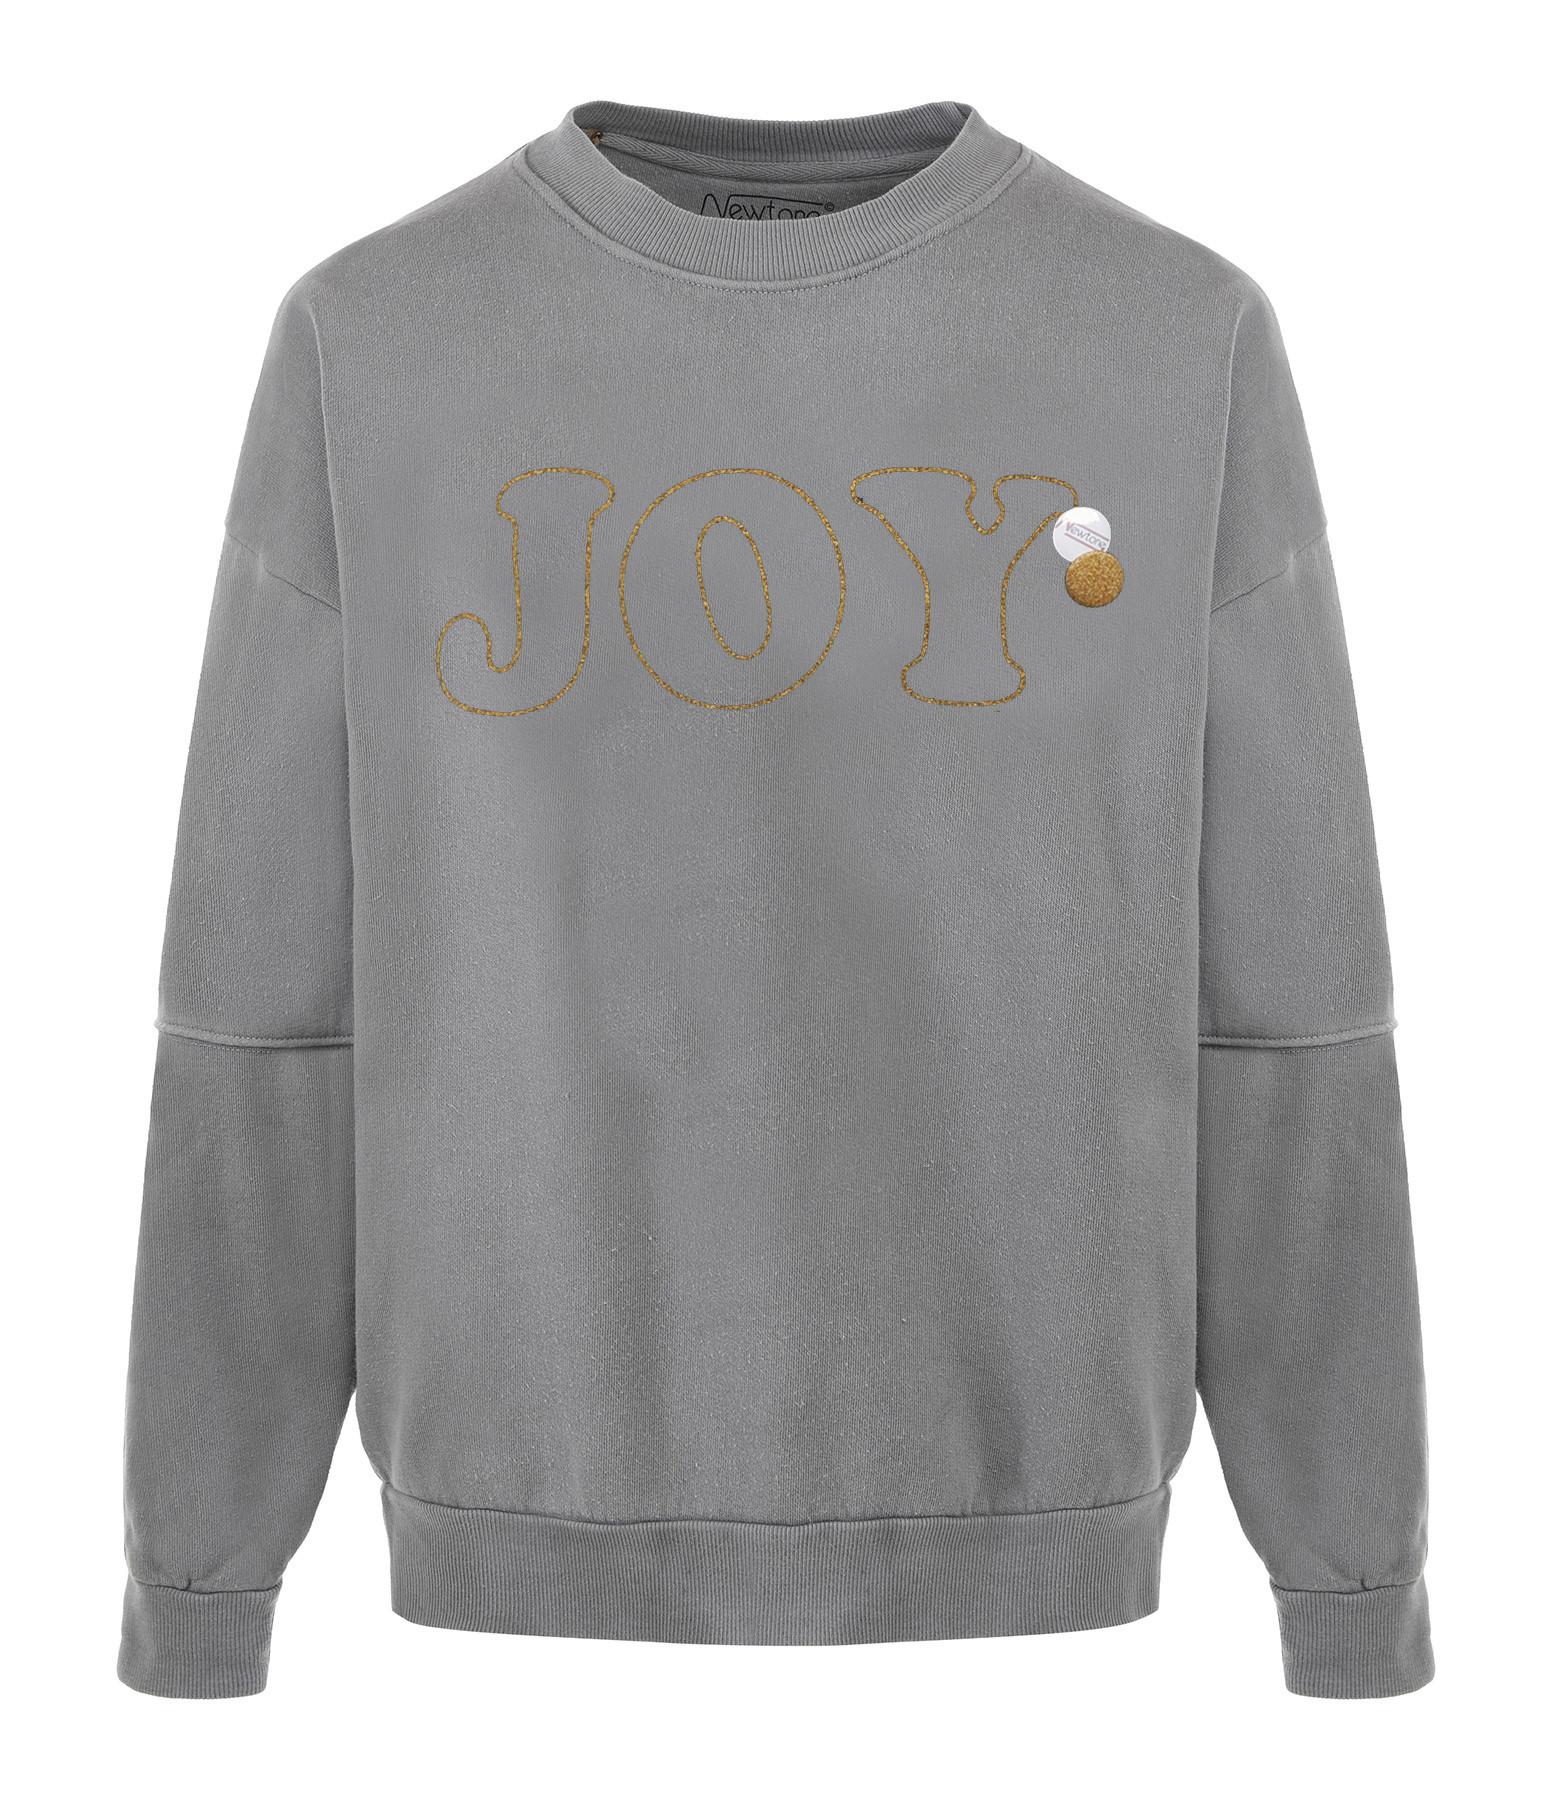 NEWTONE - Sweatshirt Roller Joy Coton Gris